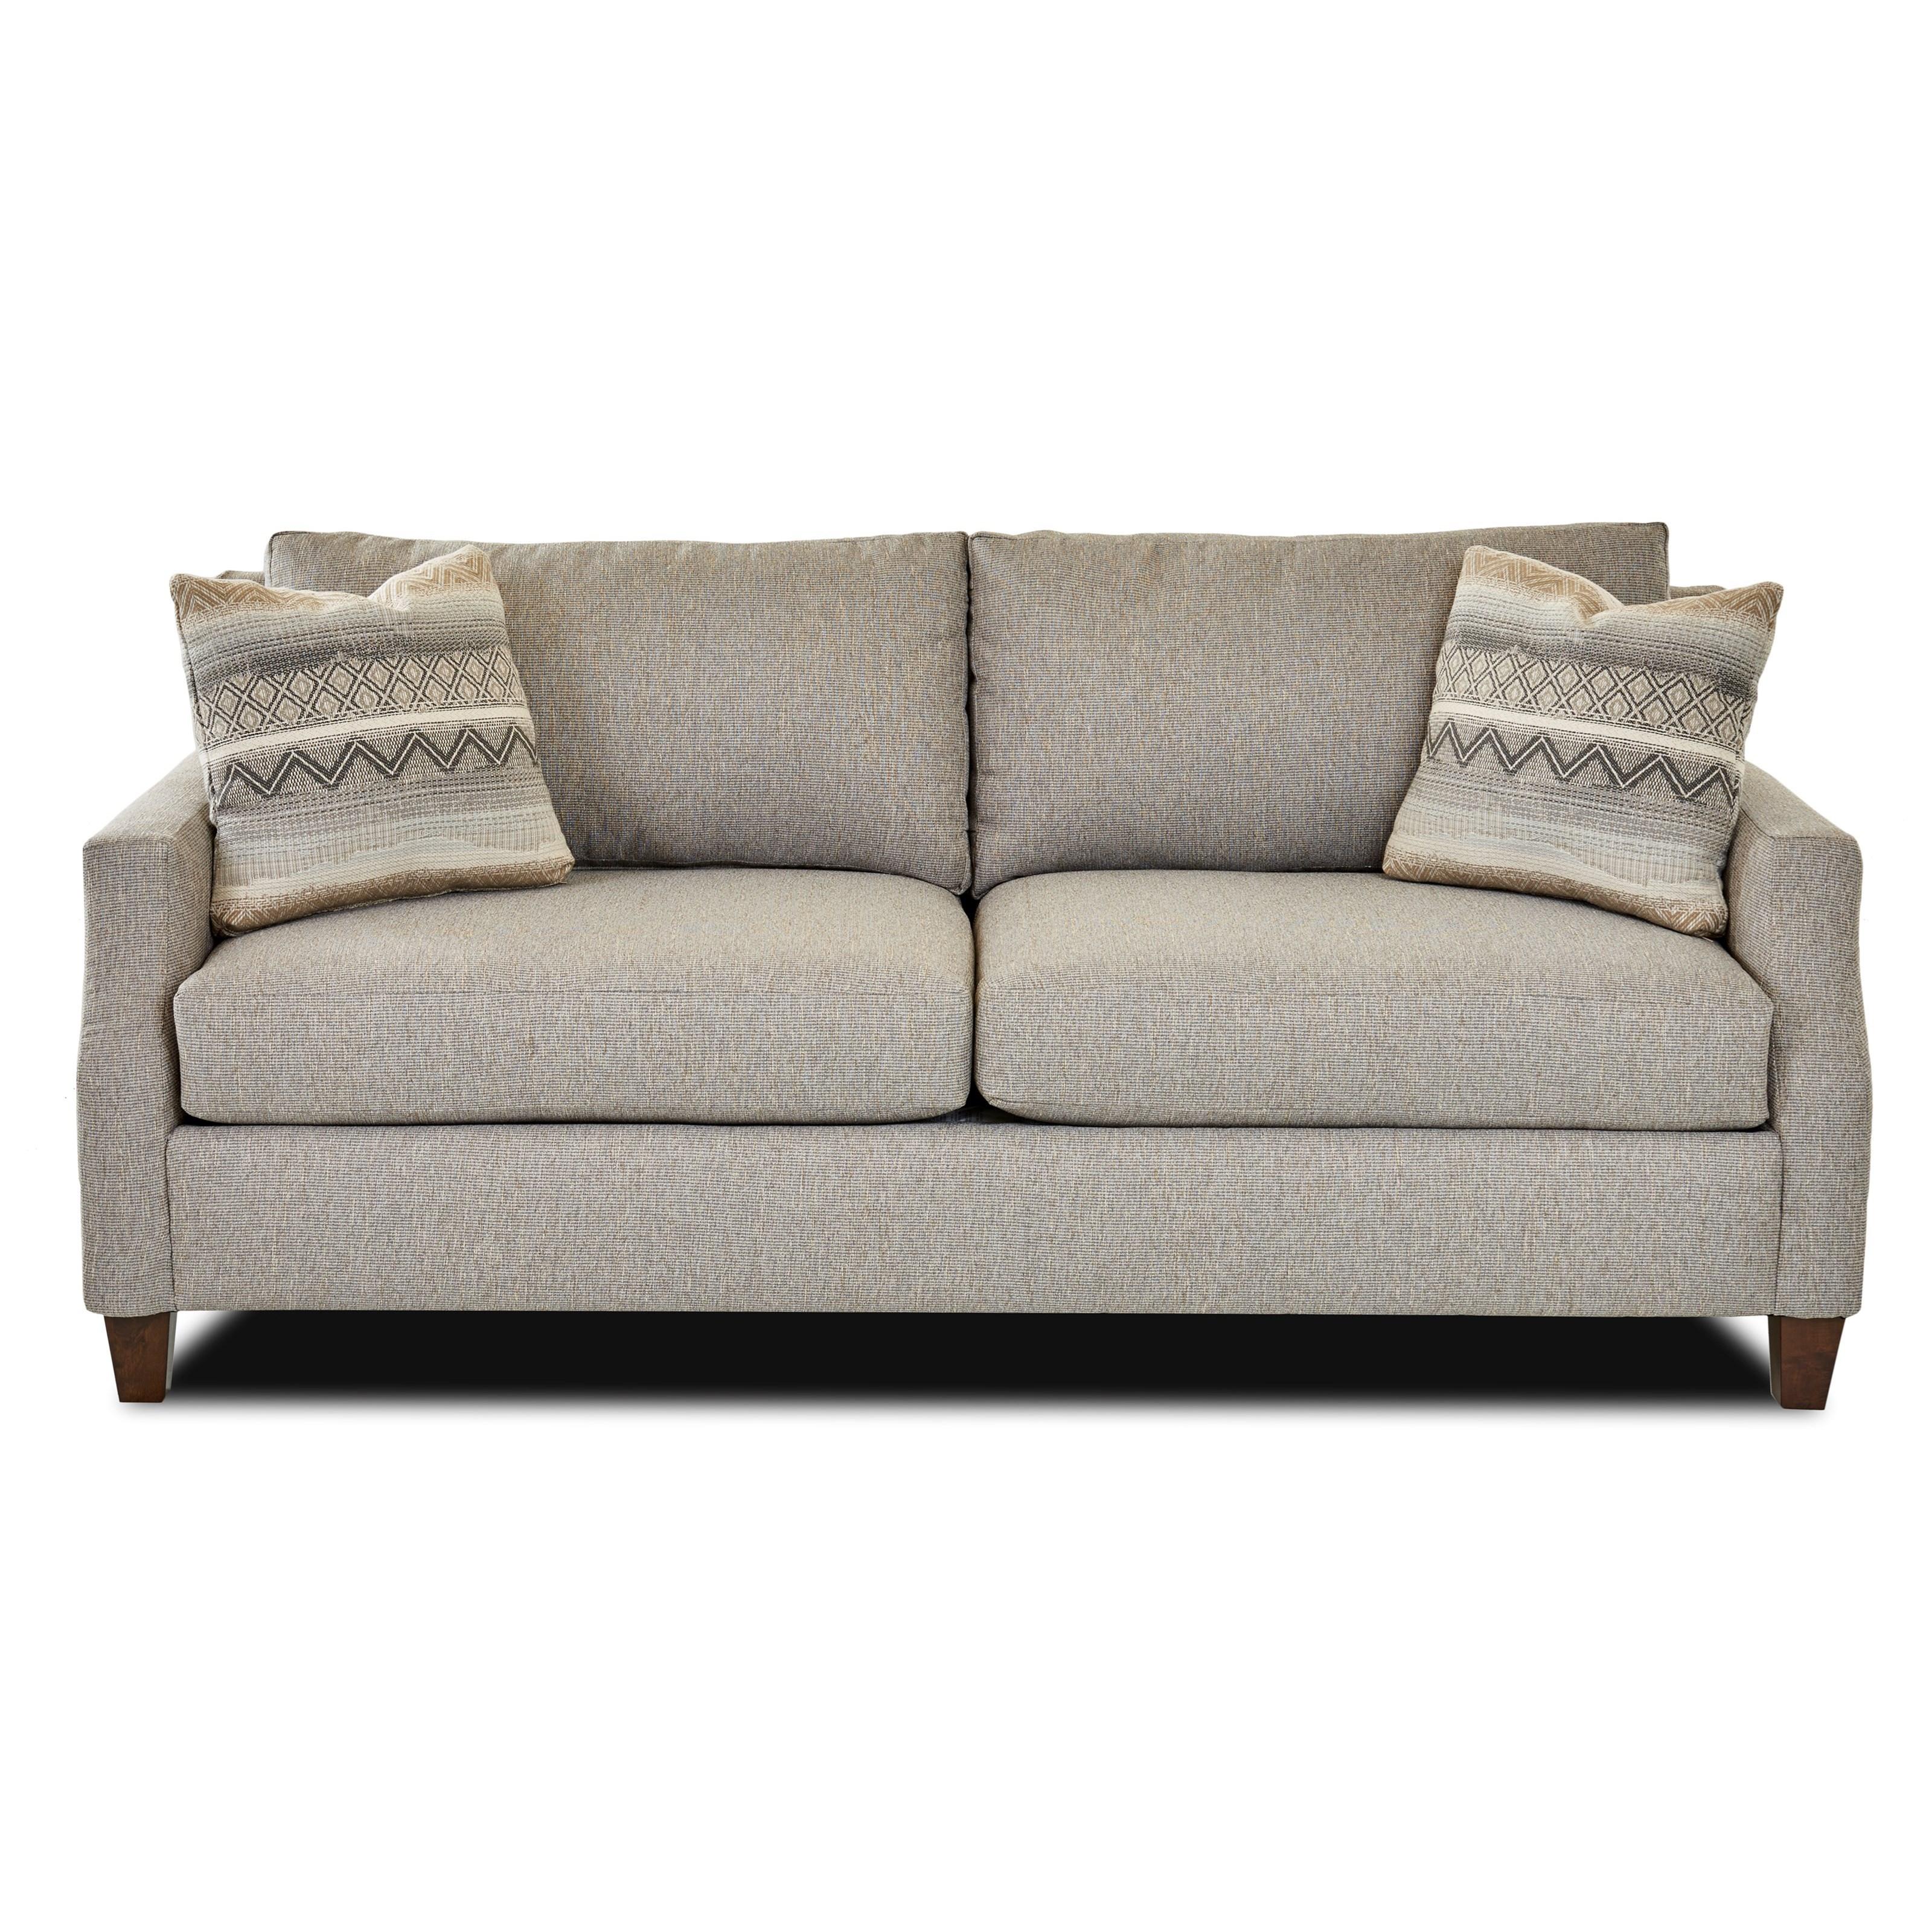 Gilman Transitional 2 Seat Sofa by Klaussner at Pilgrim Furniture City